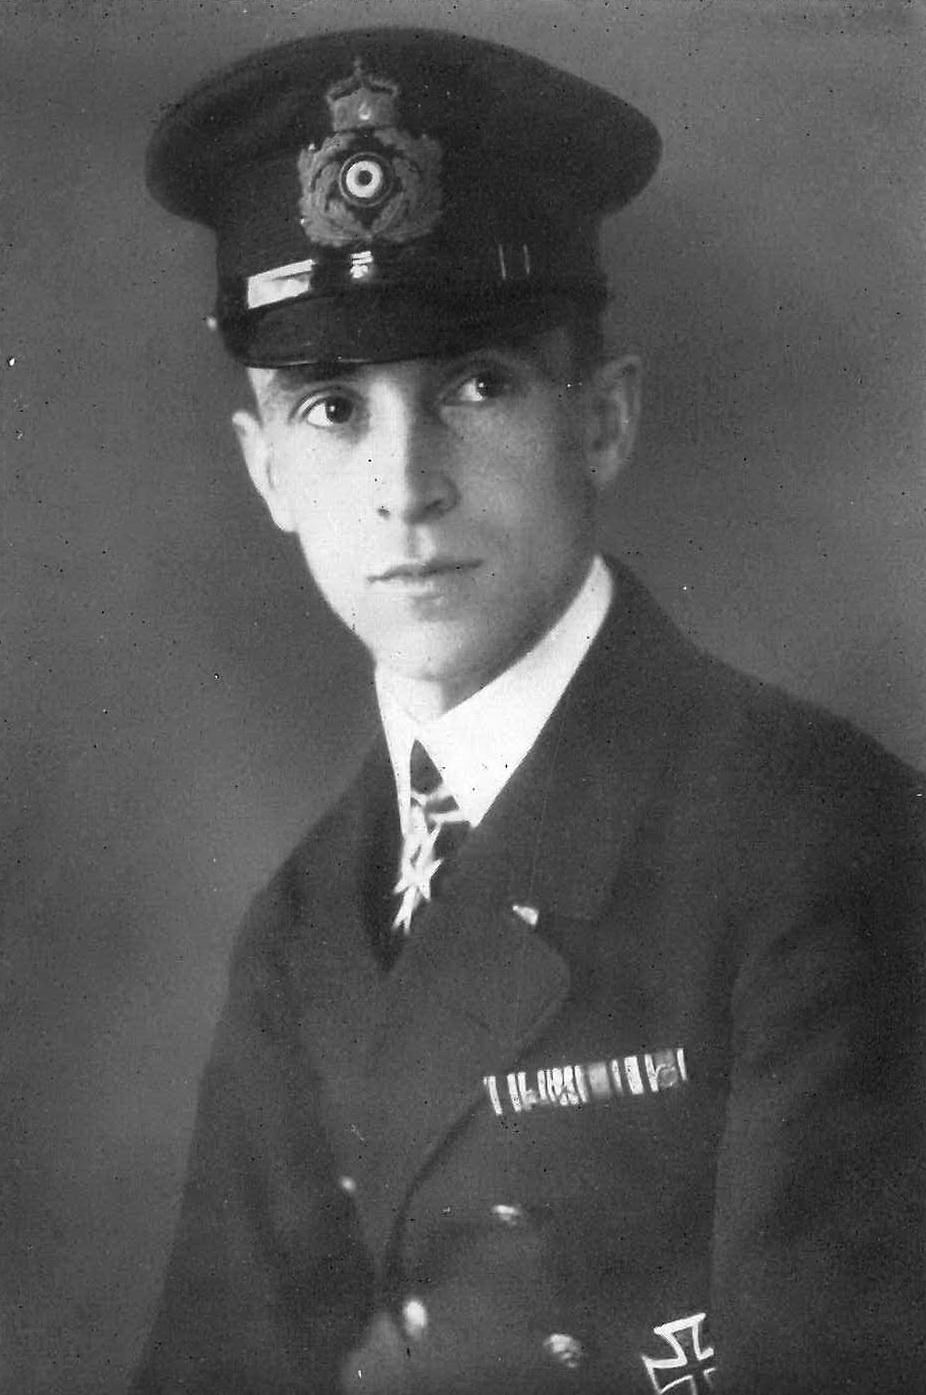 Horst Freiherr Treusch von Buttlar Brandenfels, kaptajn på luftskibet L54 (Fra hans bog Zeppeline gegen England).